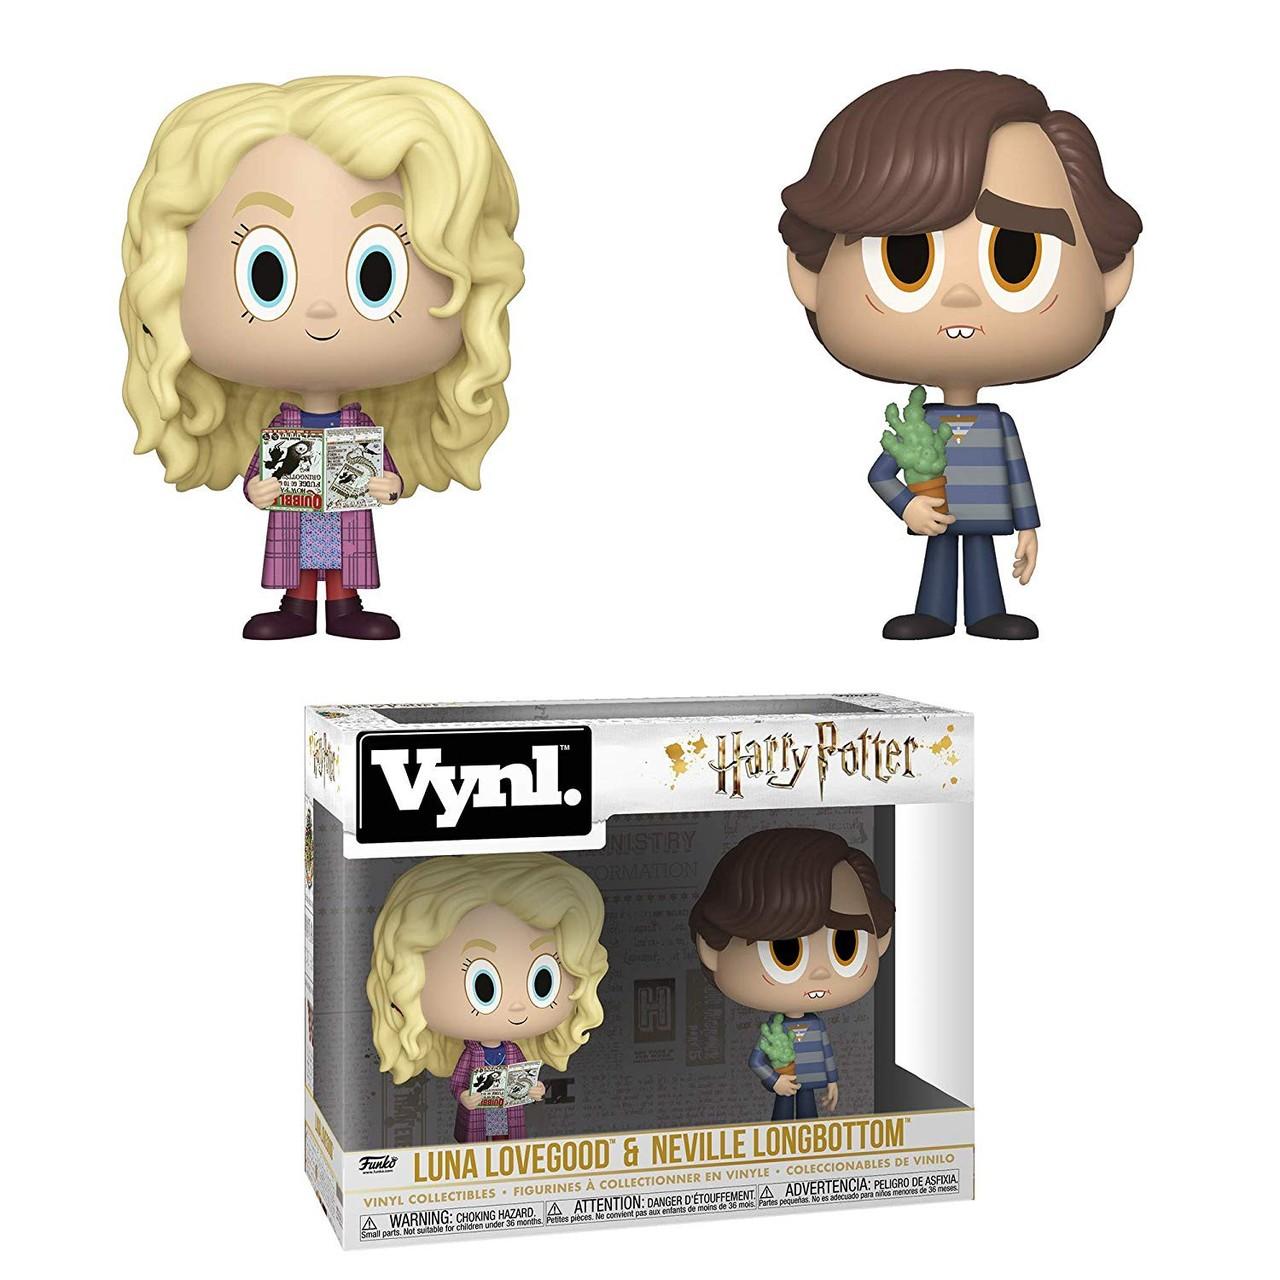 Funko! Vynl Harry Potter Luna Lovegood + Neville Longbottom